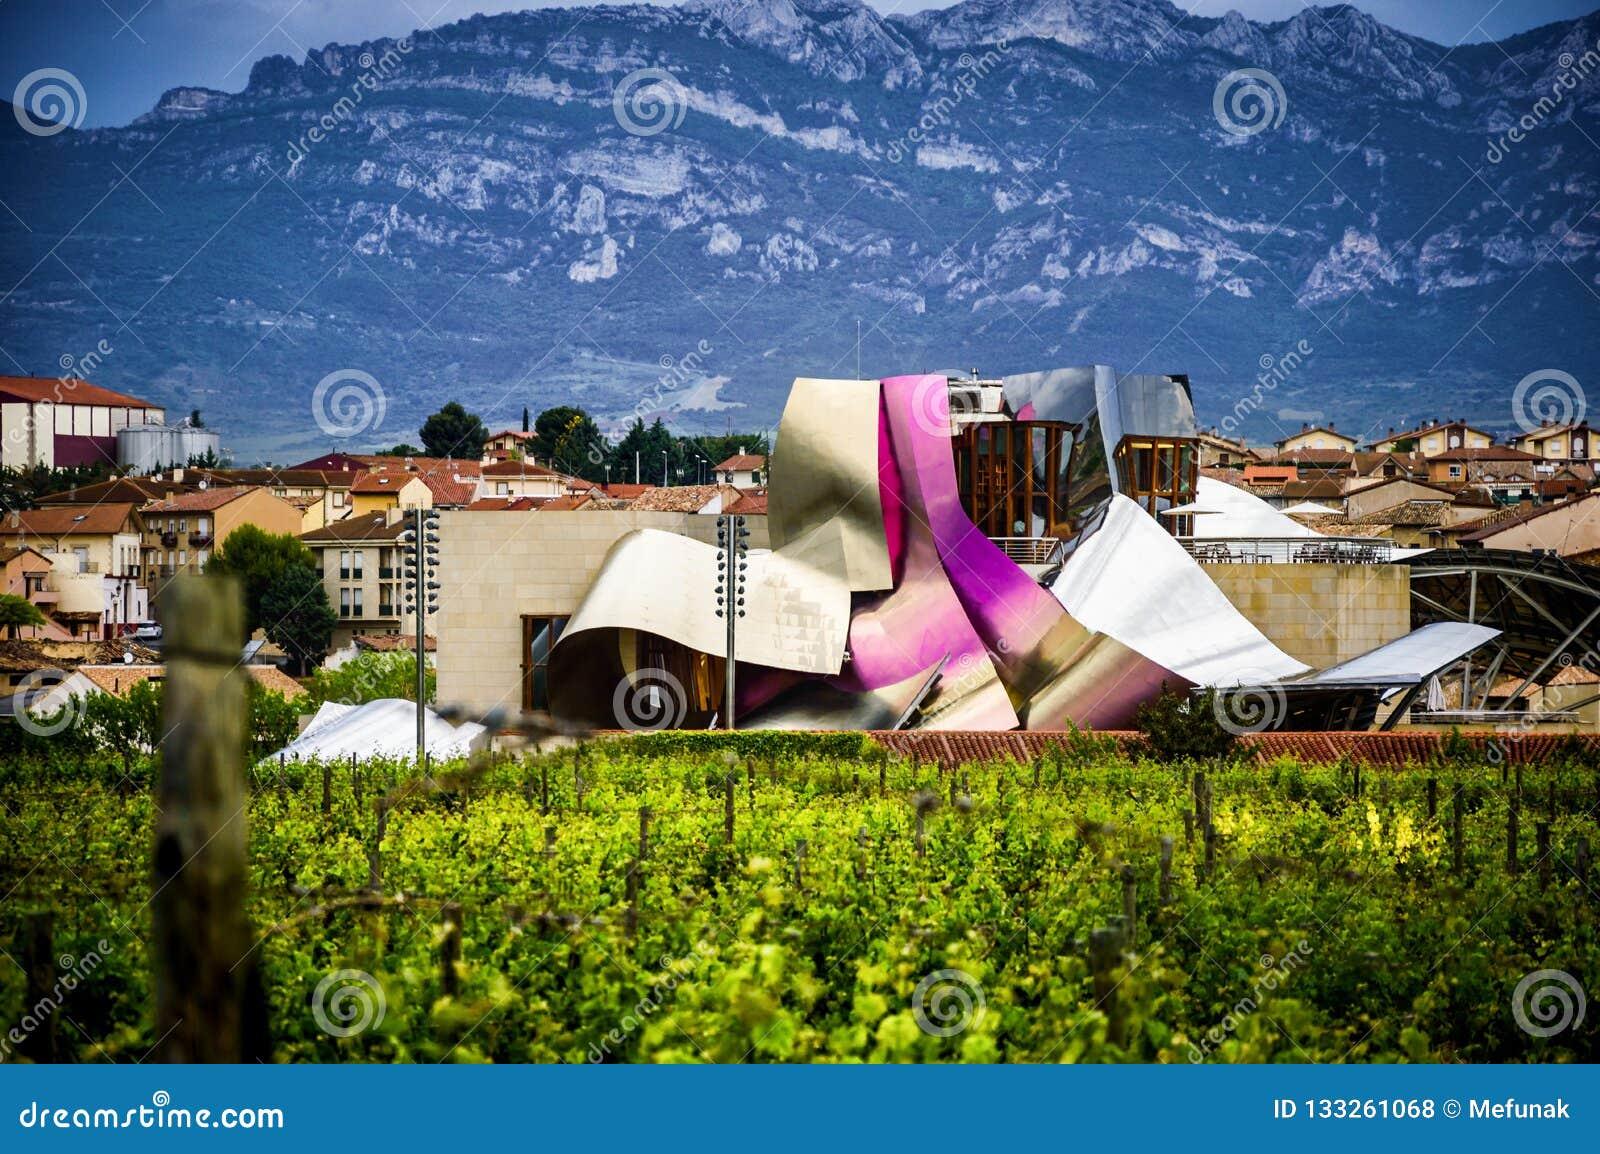 Bodega Winery Marques De Riscal Rioja Spain Stock Photo Image Of